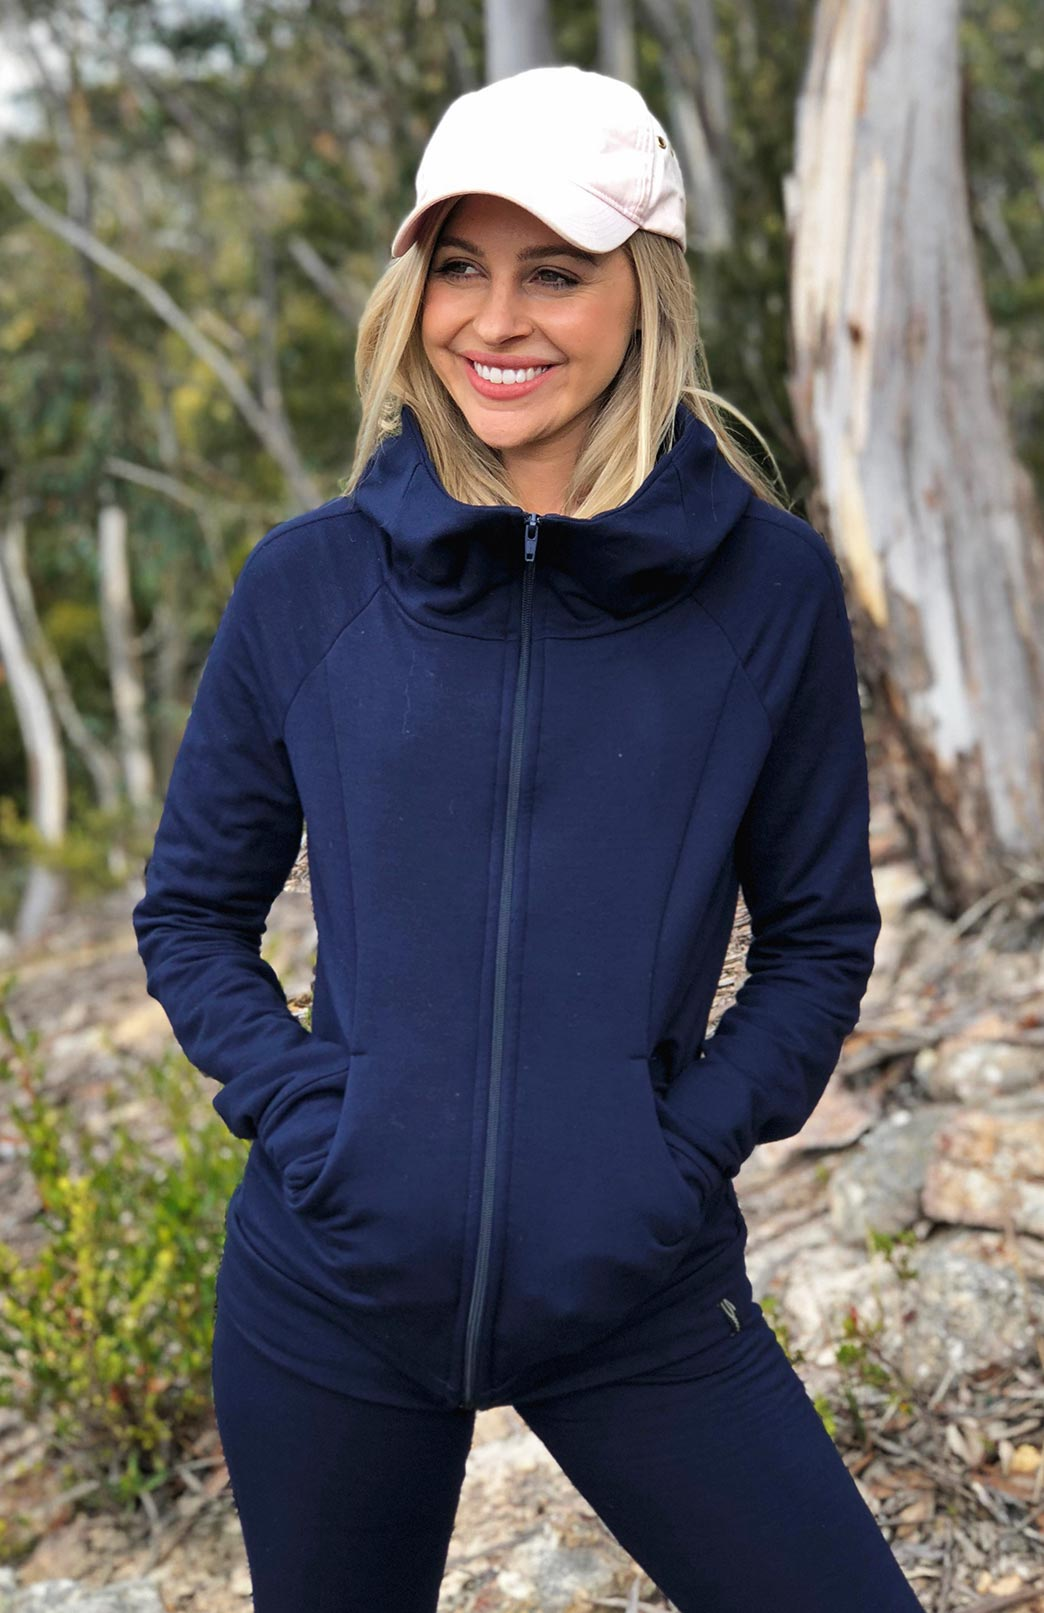 Fitted Fleece Hoody Jacket - Women's French Navy Blue Wool Jacket with pockets and hood - Smitten Merino Tasmania Australia